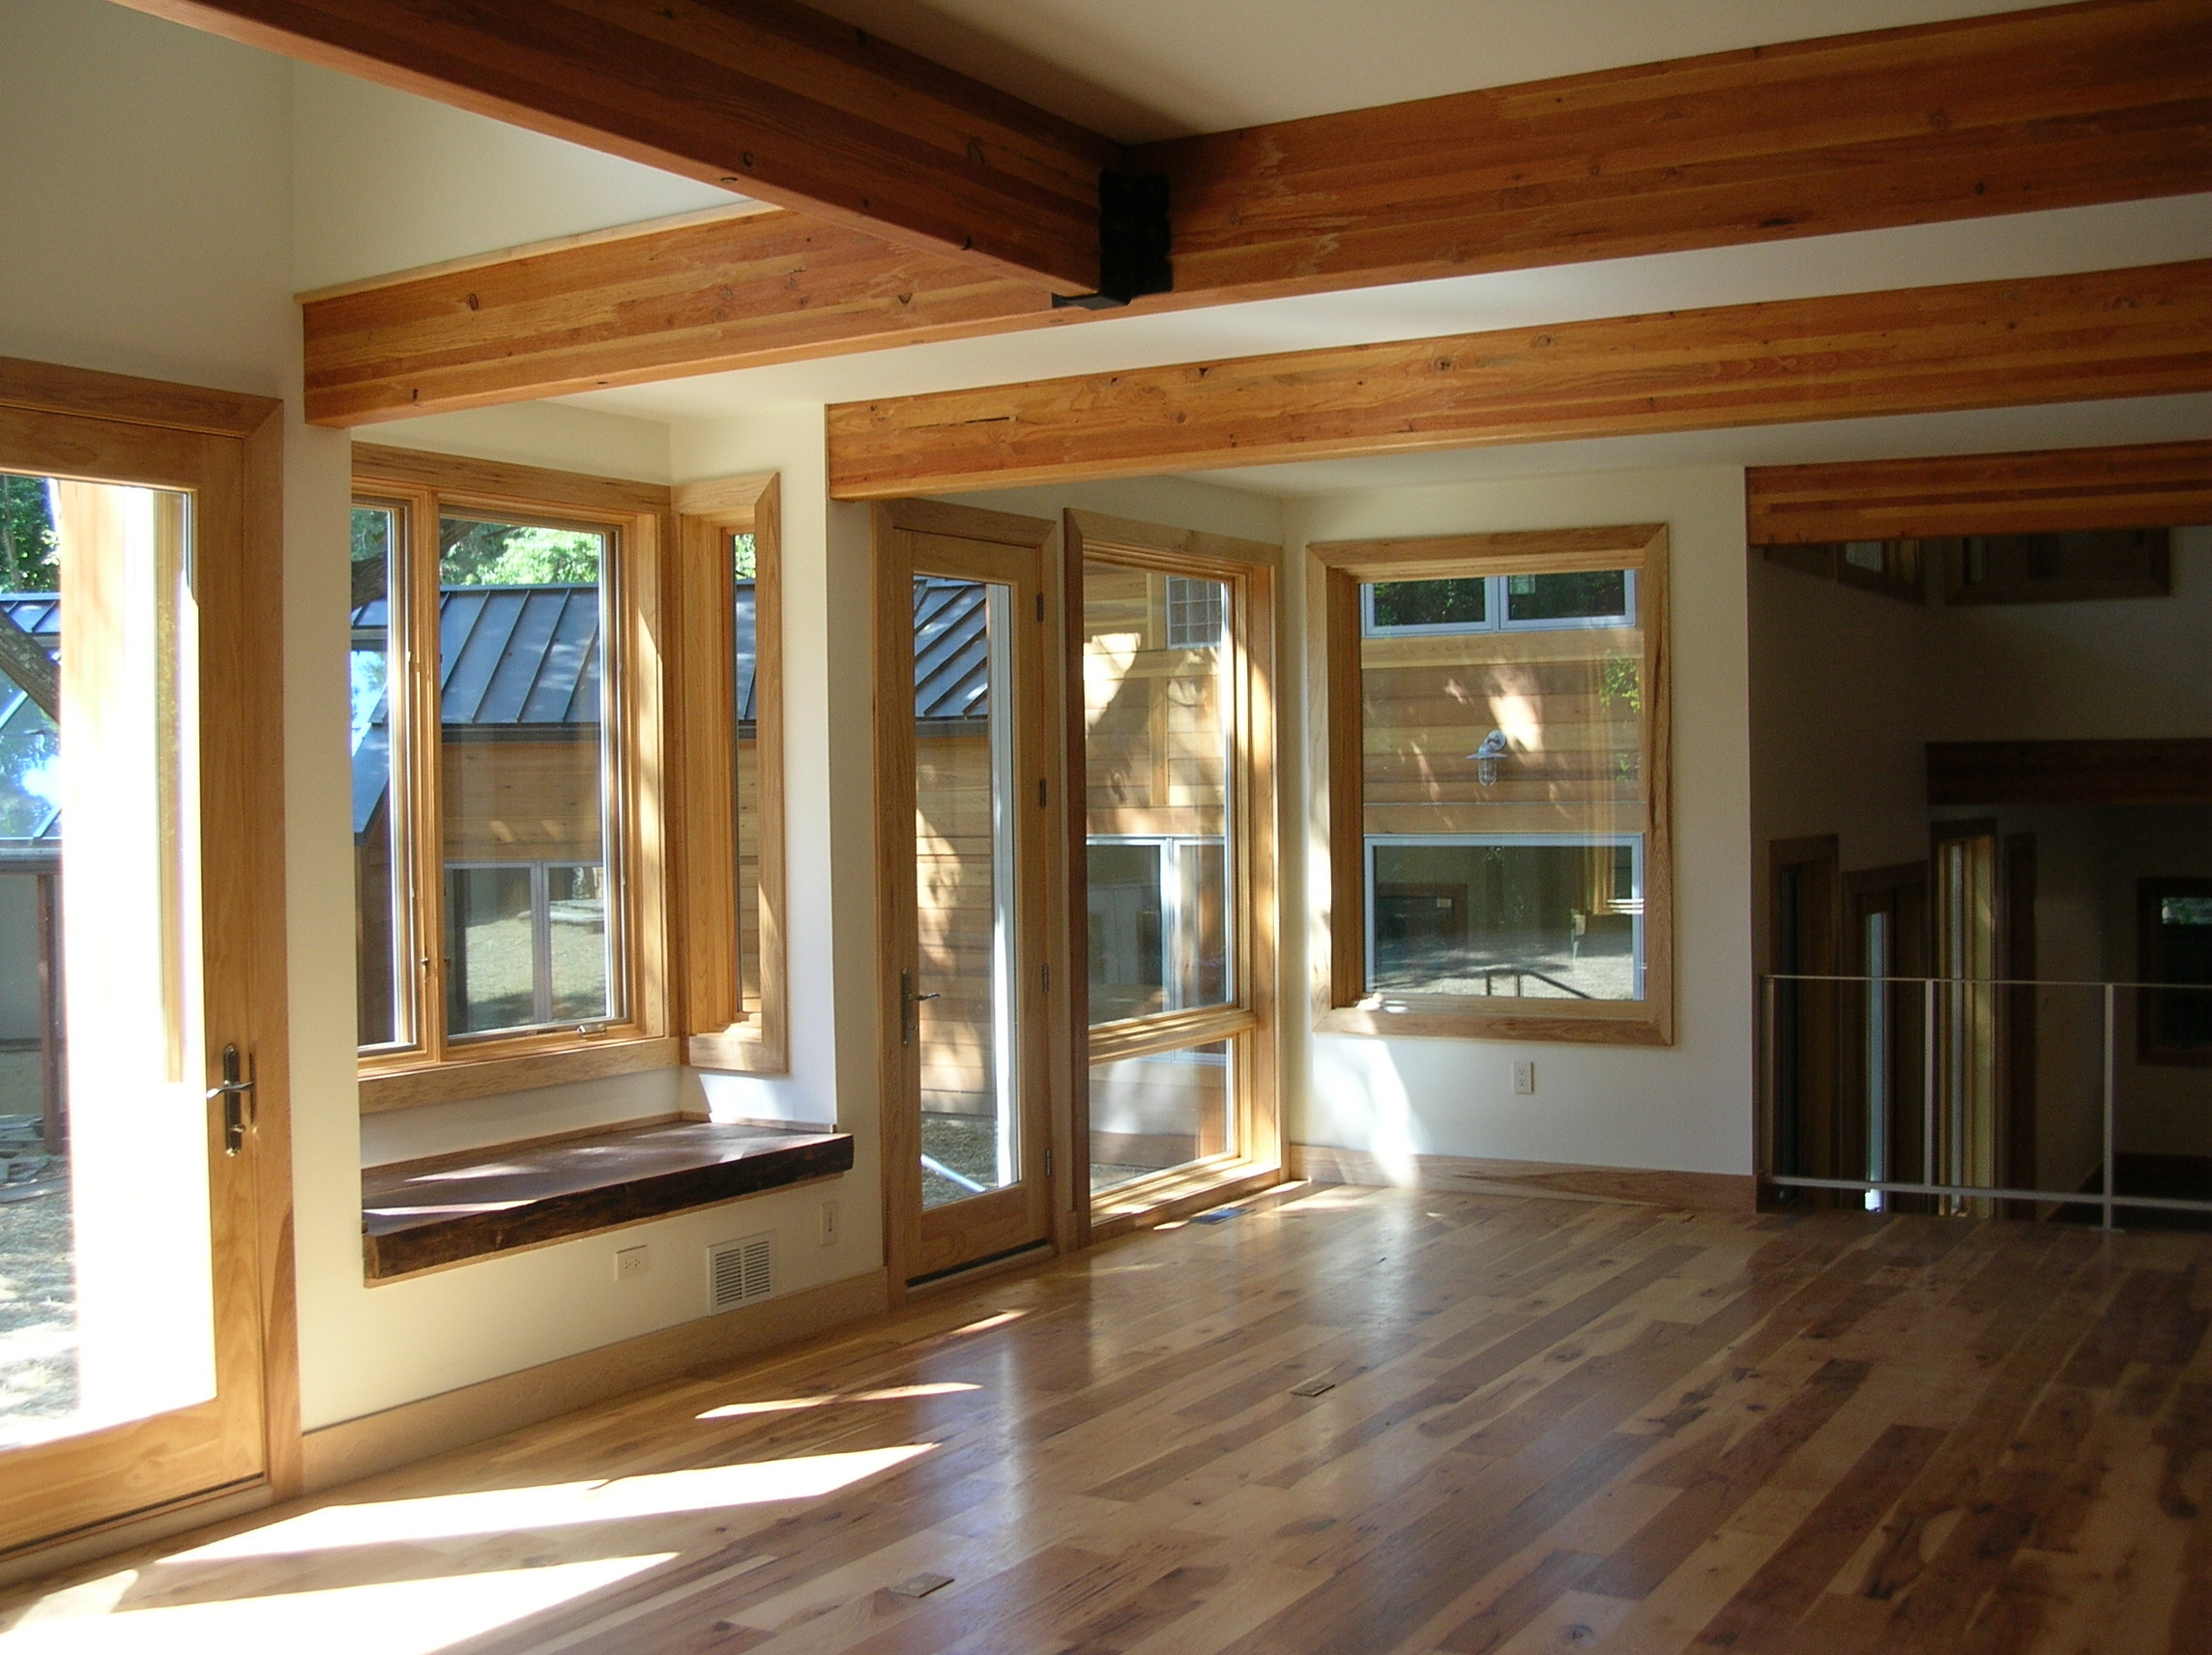 Price Living Room Wood Windows Wood Flooring Glulam Beams Metal Railing.jpg